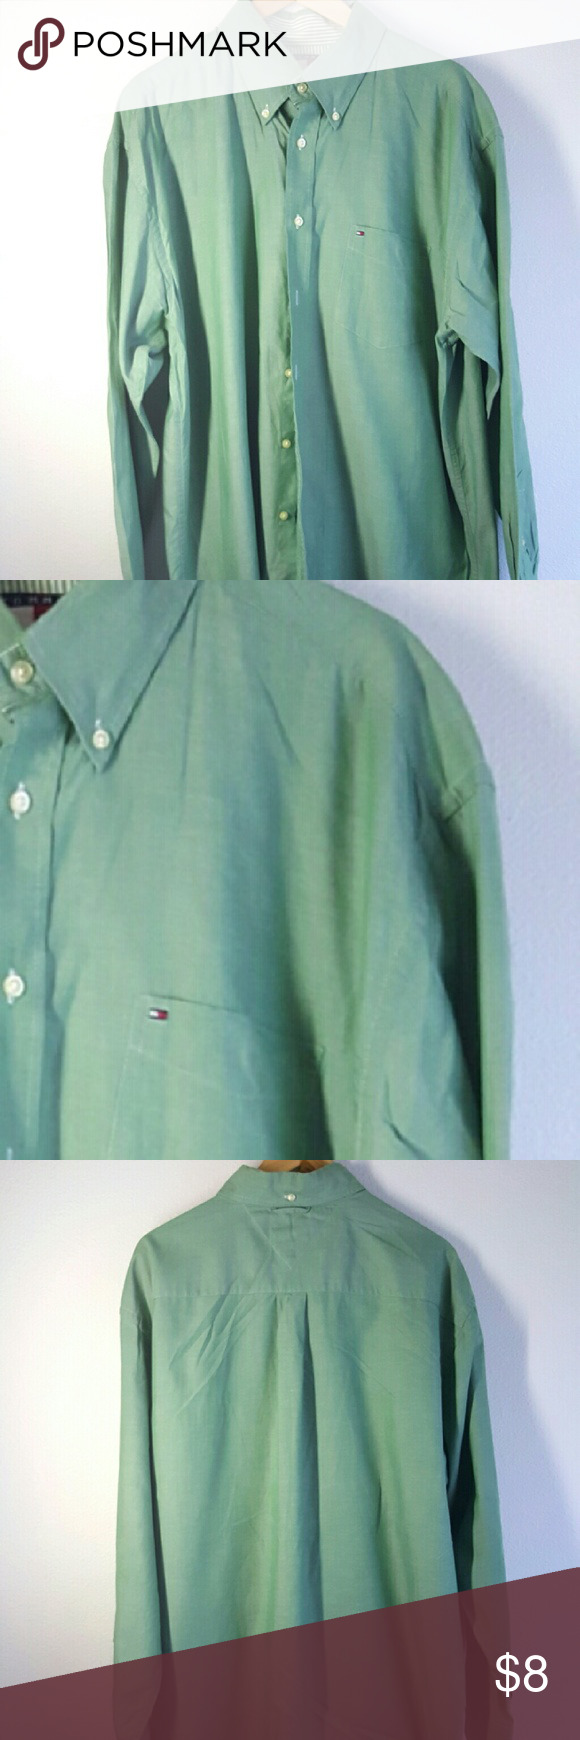 Tommy Hilfiger Mens Oxford Shirt XL Solid Oxford shirt Green! Very Comfortable!! Tommy Hilfiger Tops Button Down Shirts